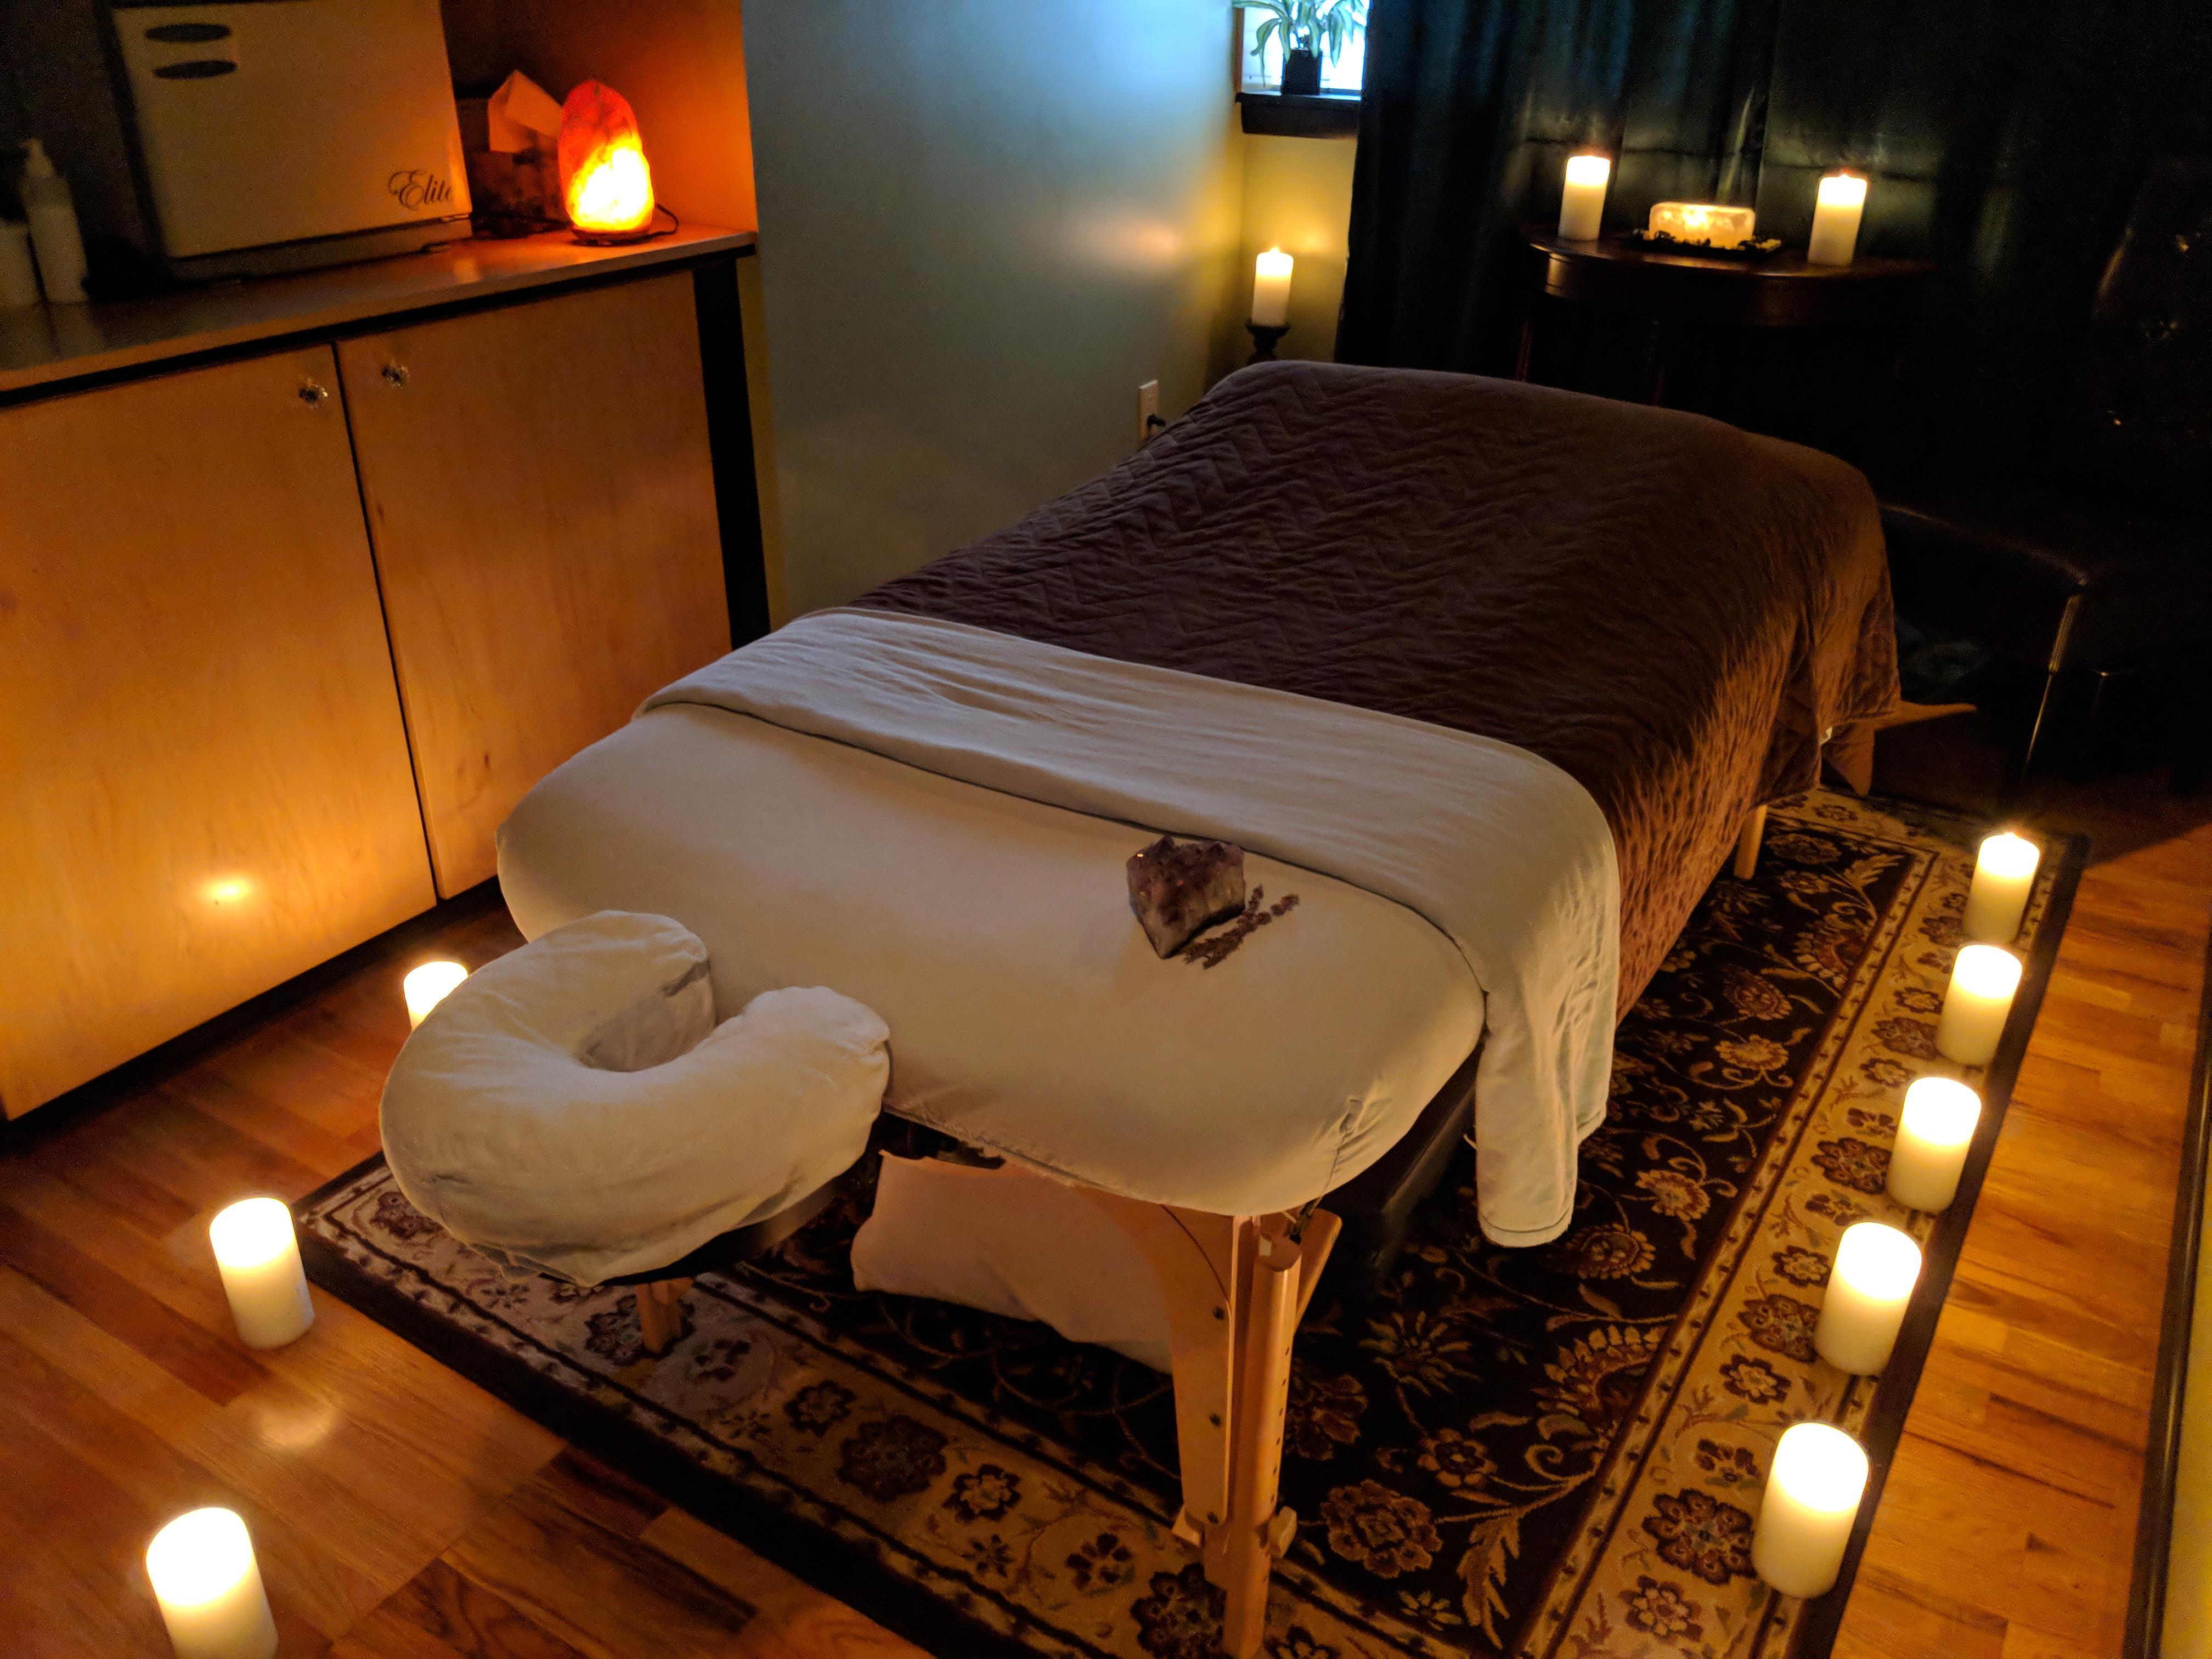 Liberation Yoga & Wellness Center image 4